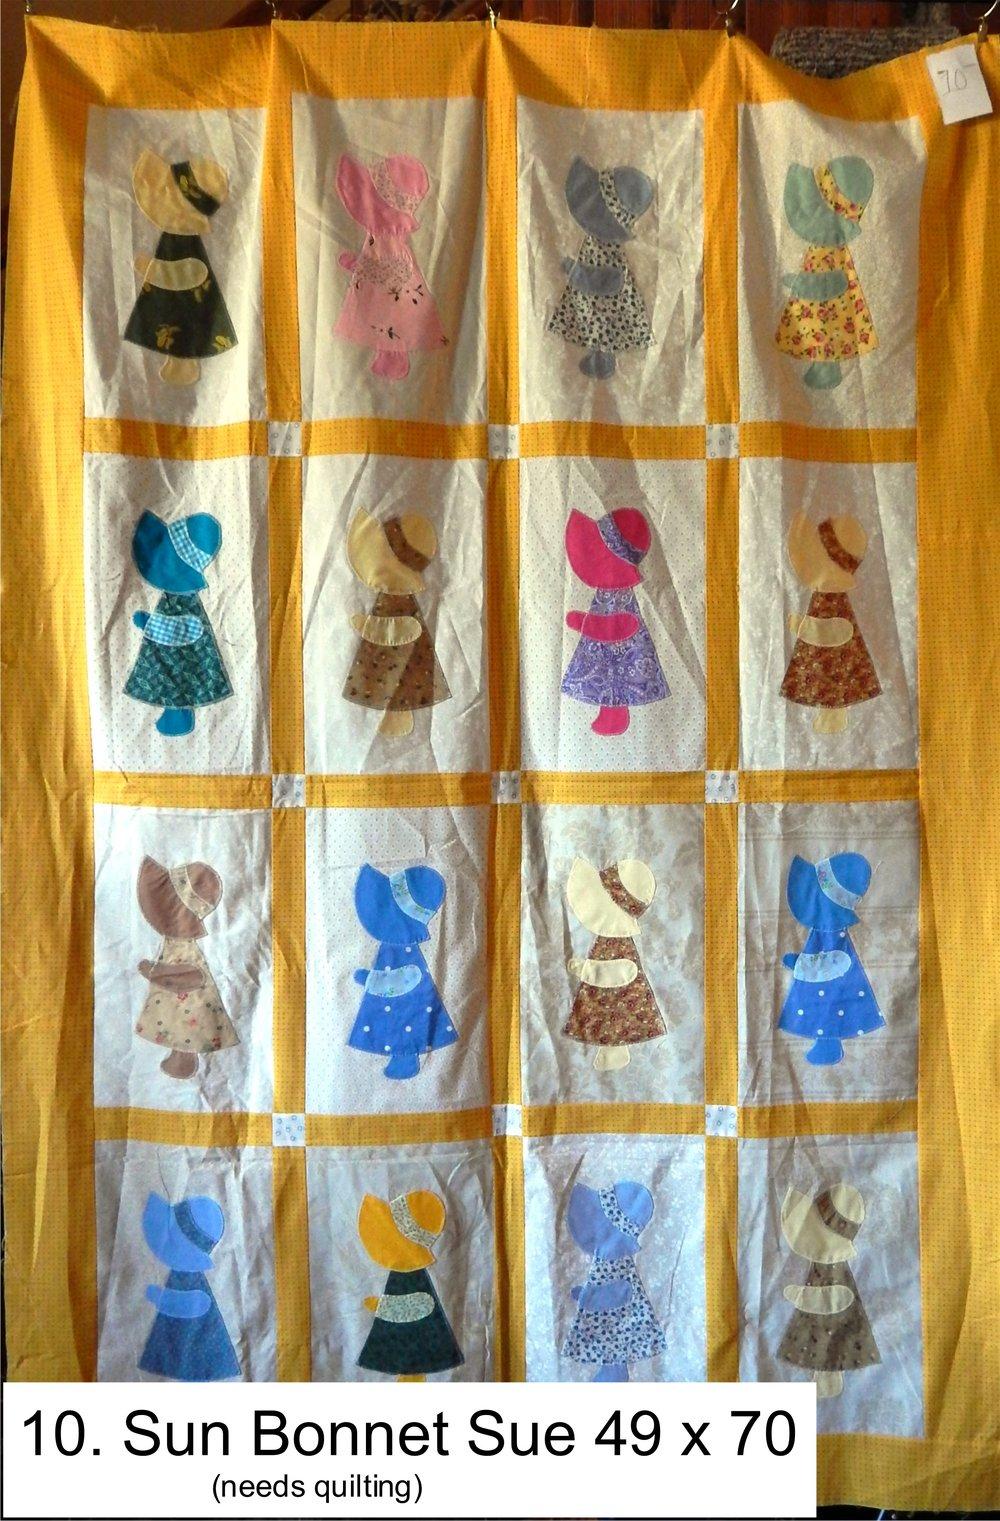 10. Sun Bonnet Sue 49 x 70.JPG